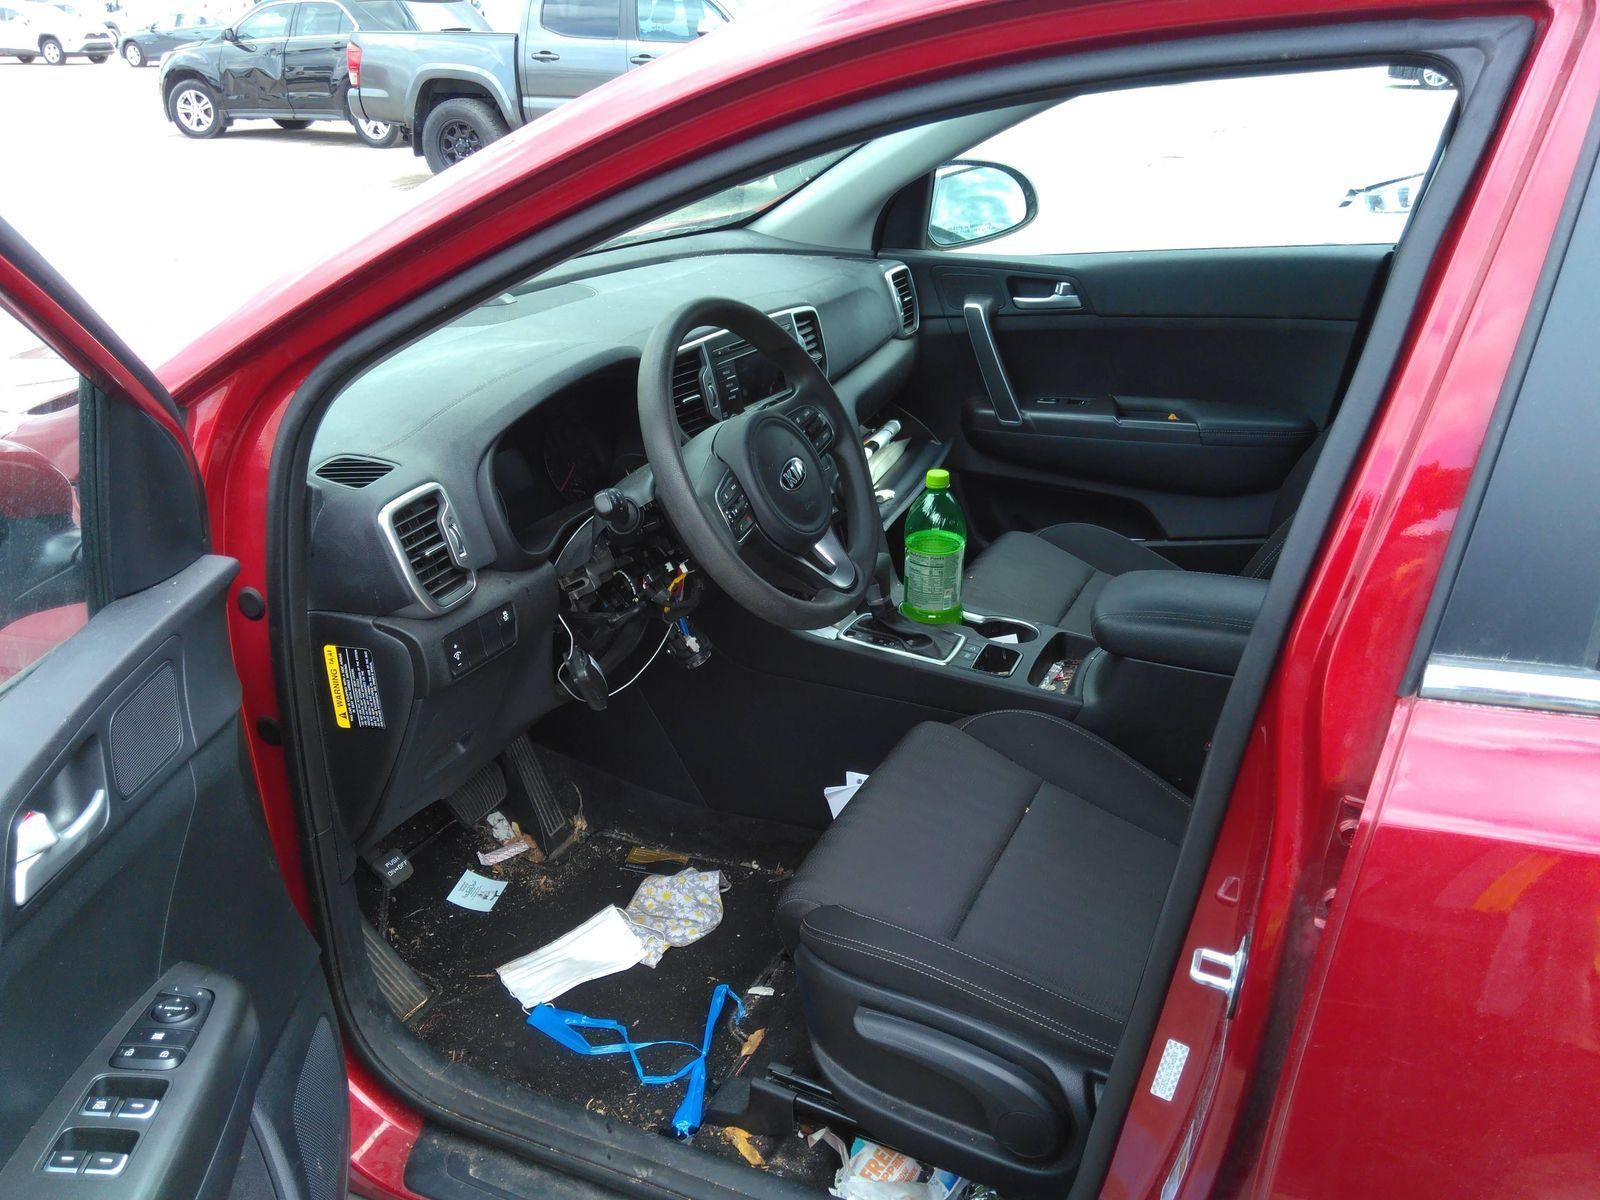 2019 KIA SPORTAGE FWD 4C LX - 3